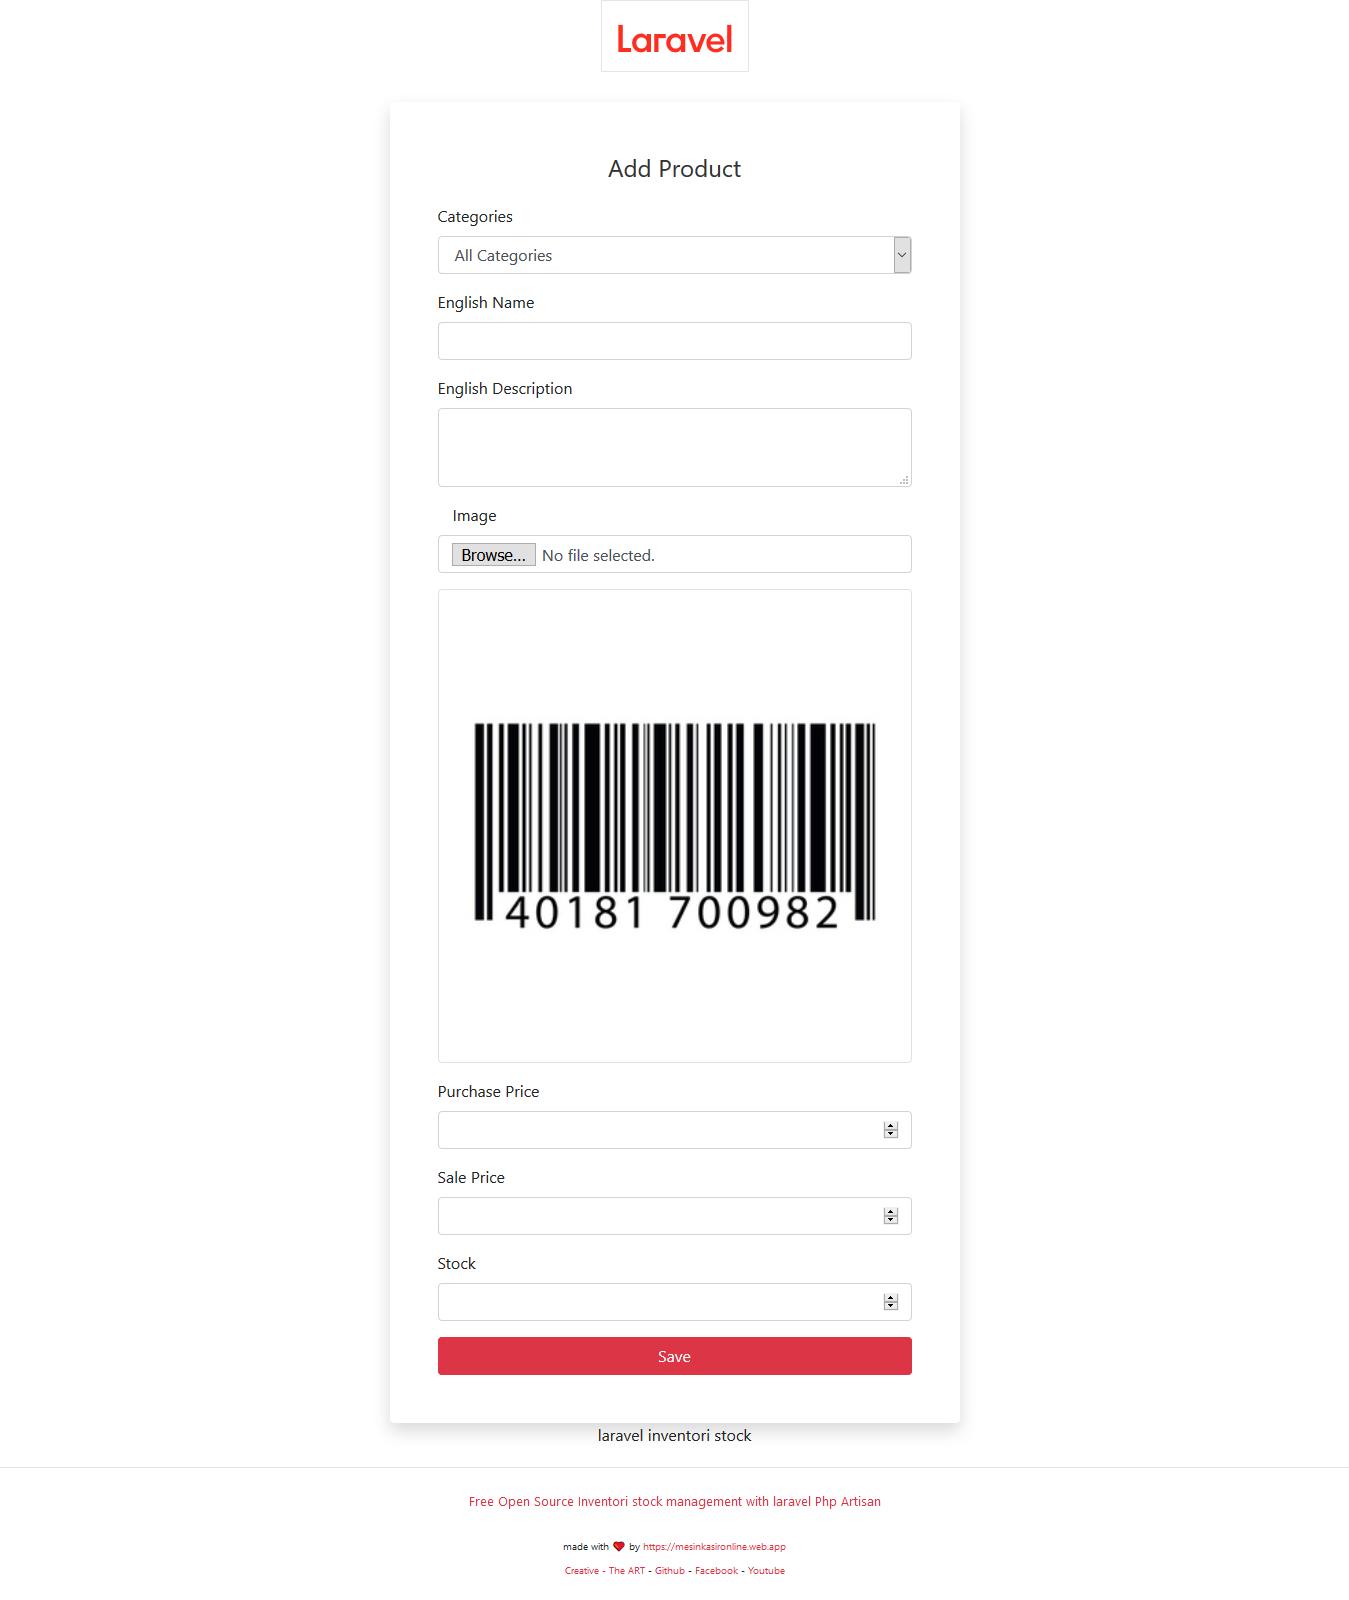 Free download open source code gratis laravel stock apps inventori management